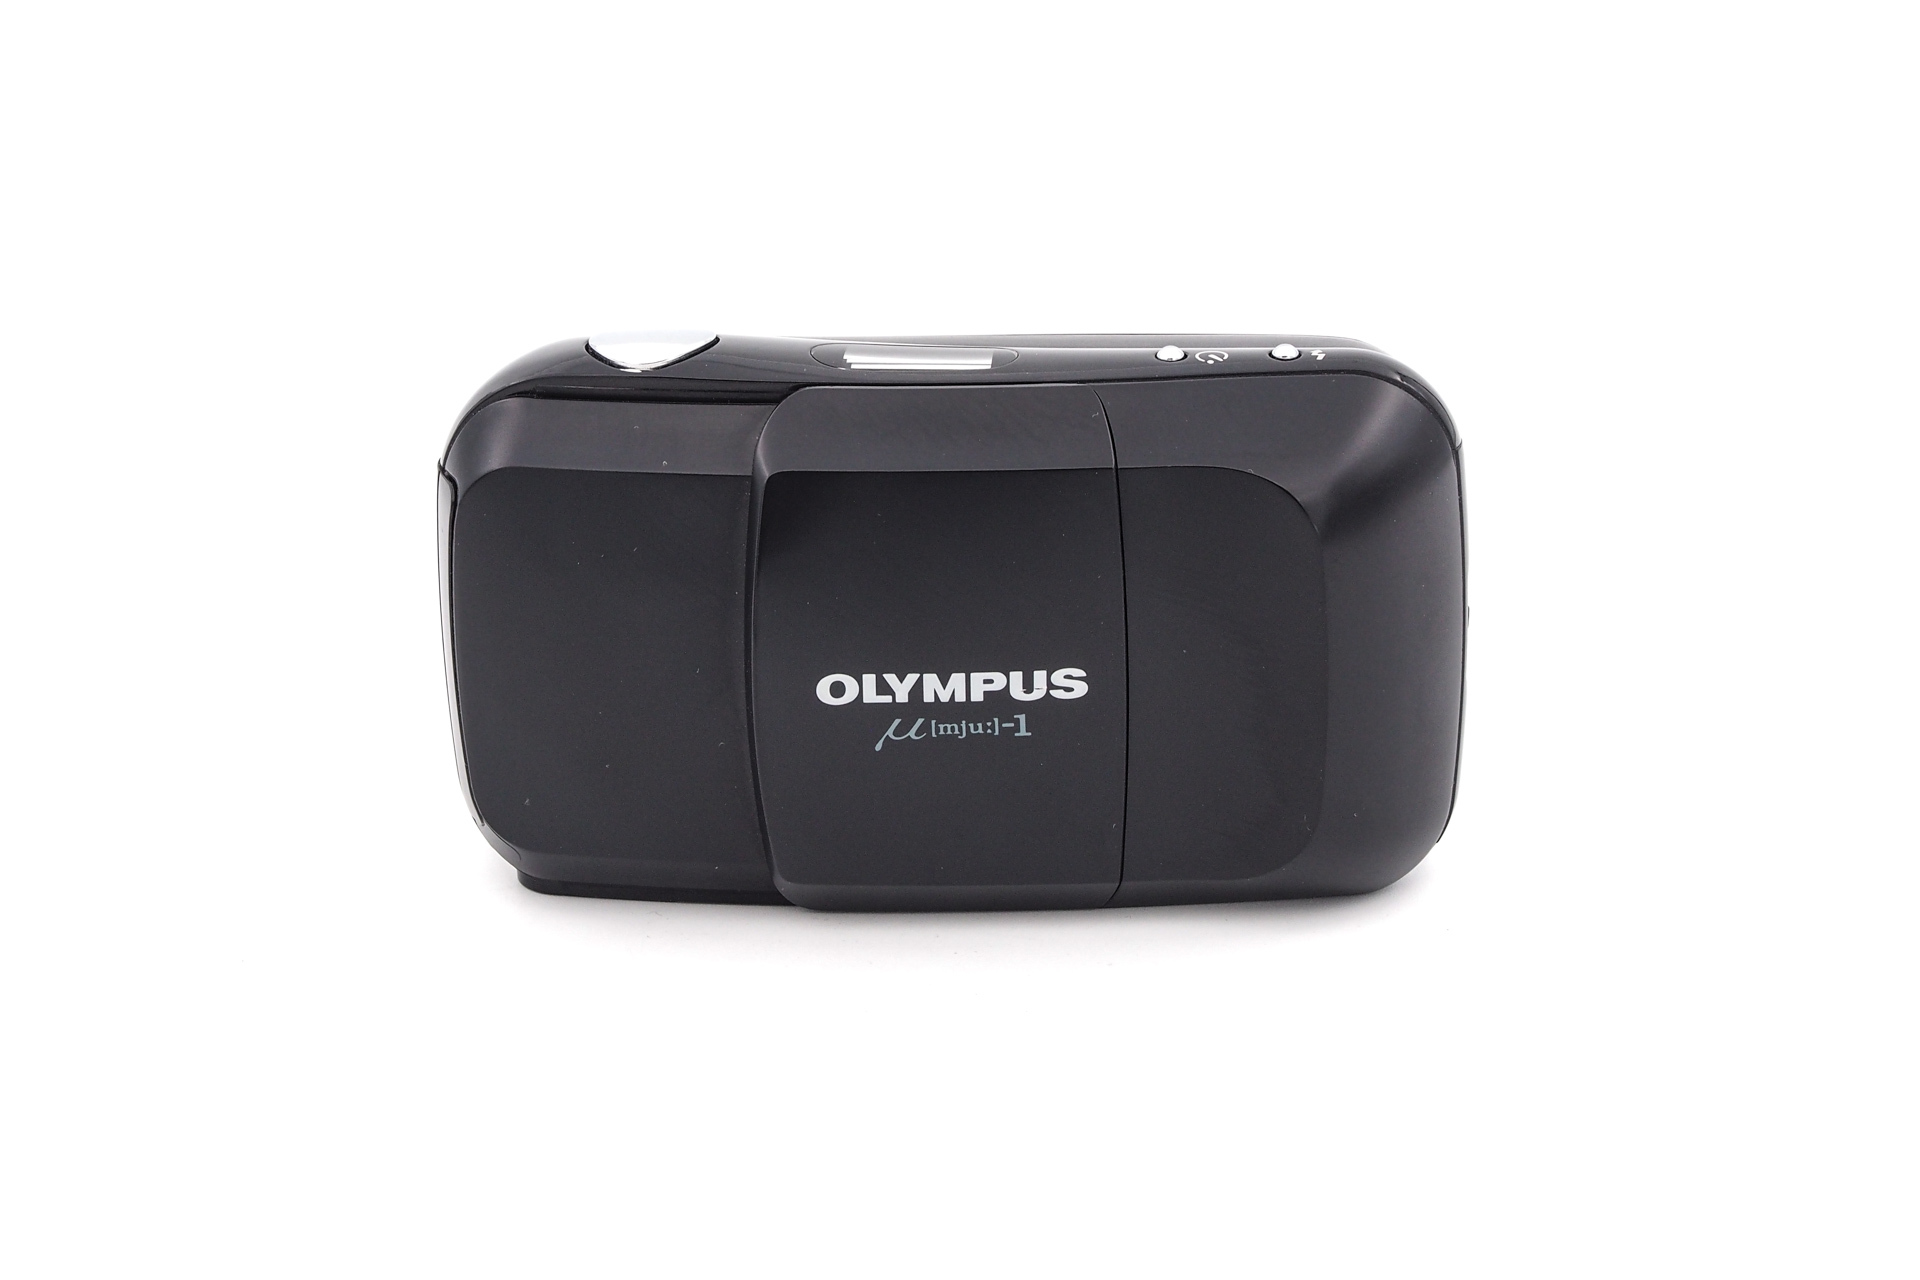 Olympus Mju-1